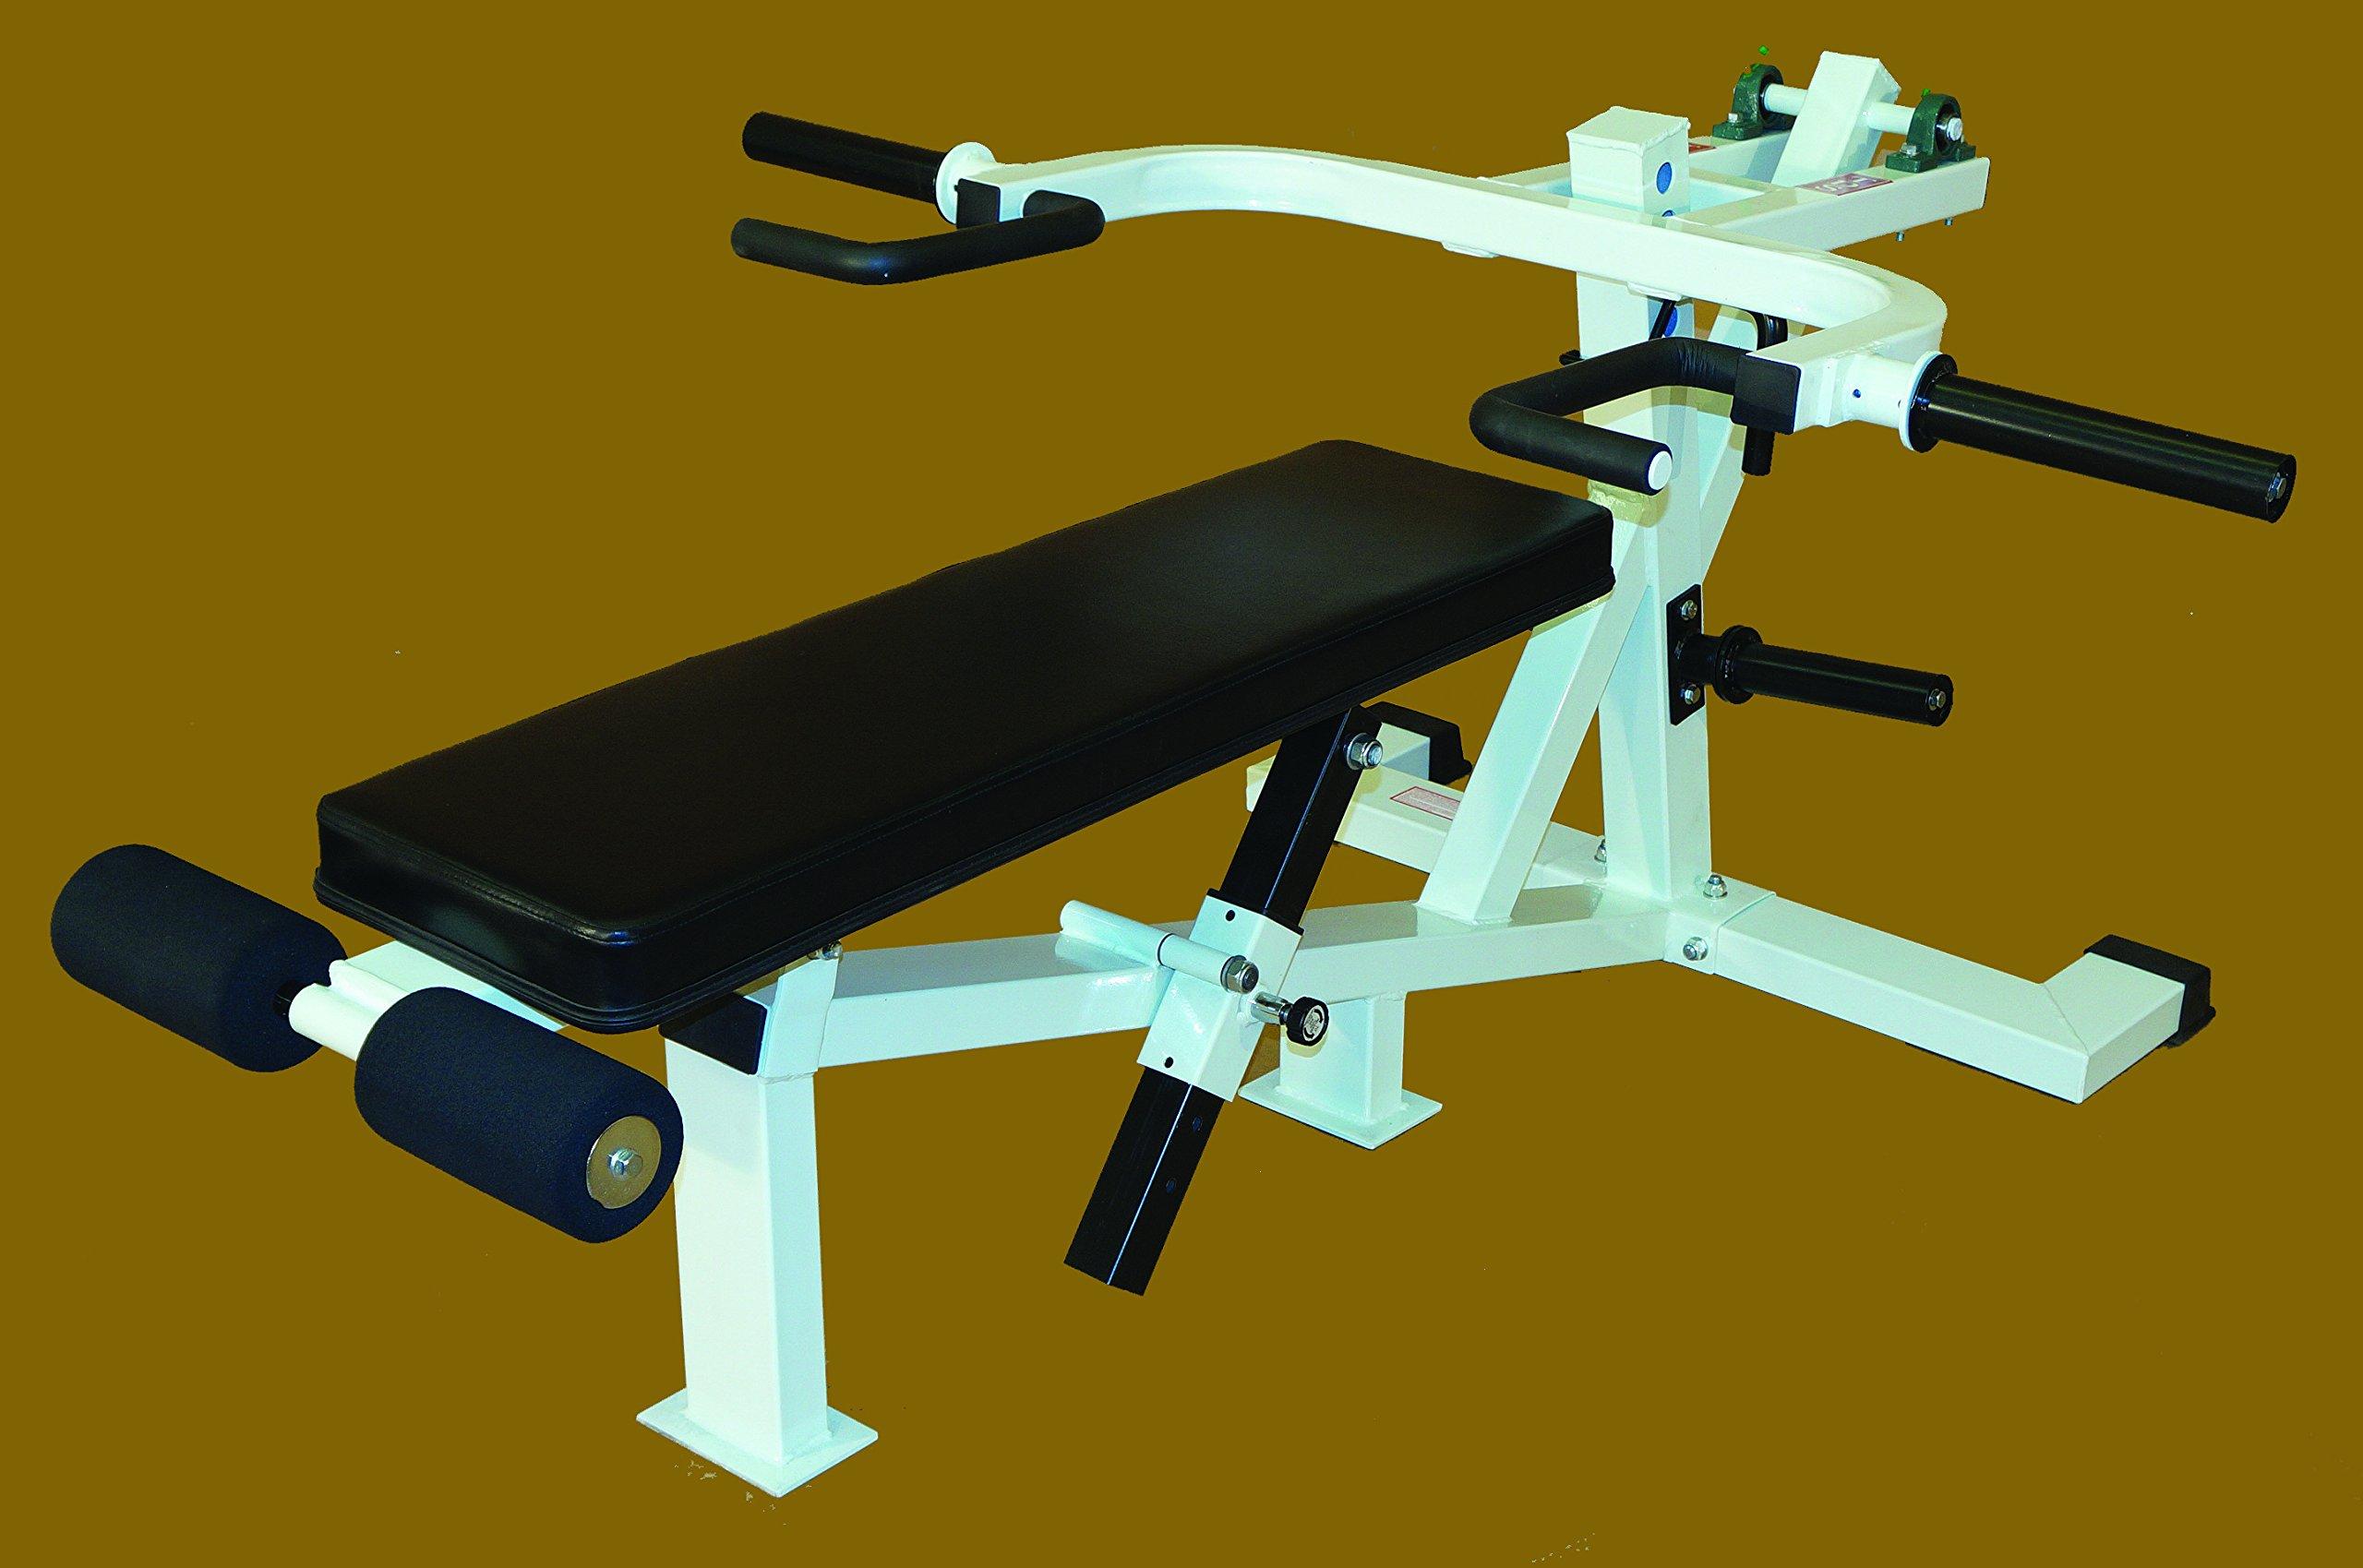 Pro Power Bench System - Gym quality